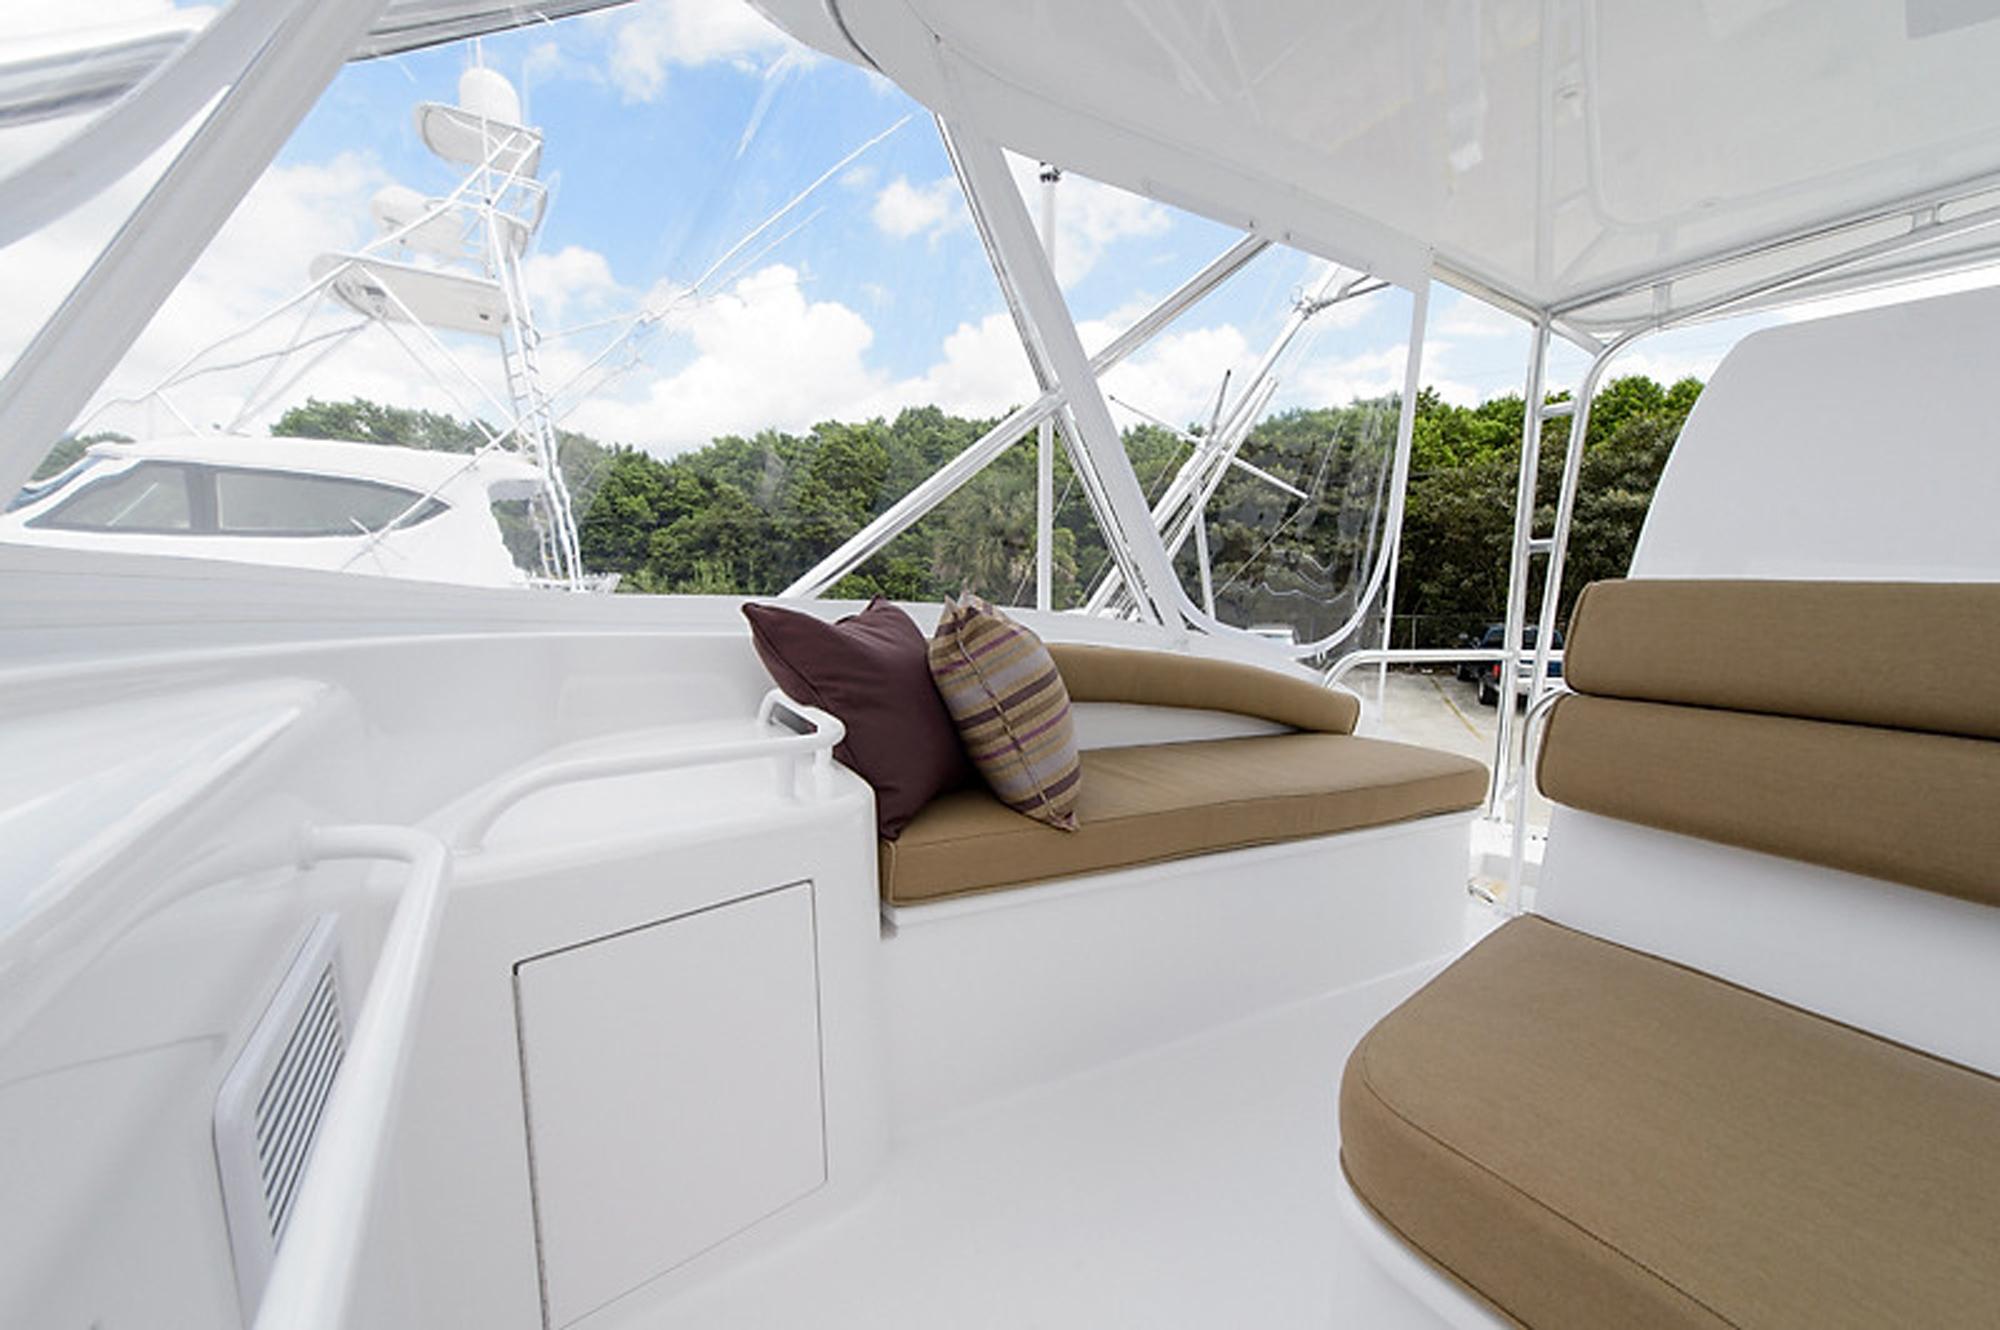 hatteras yachts